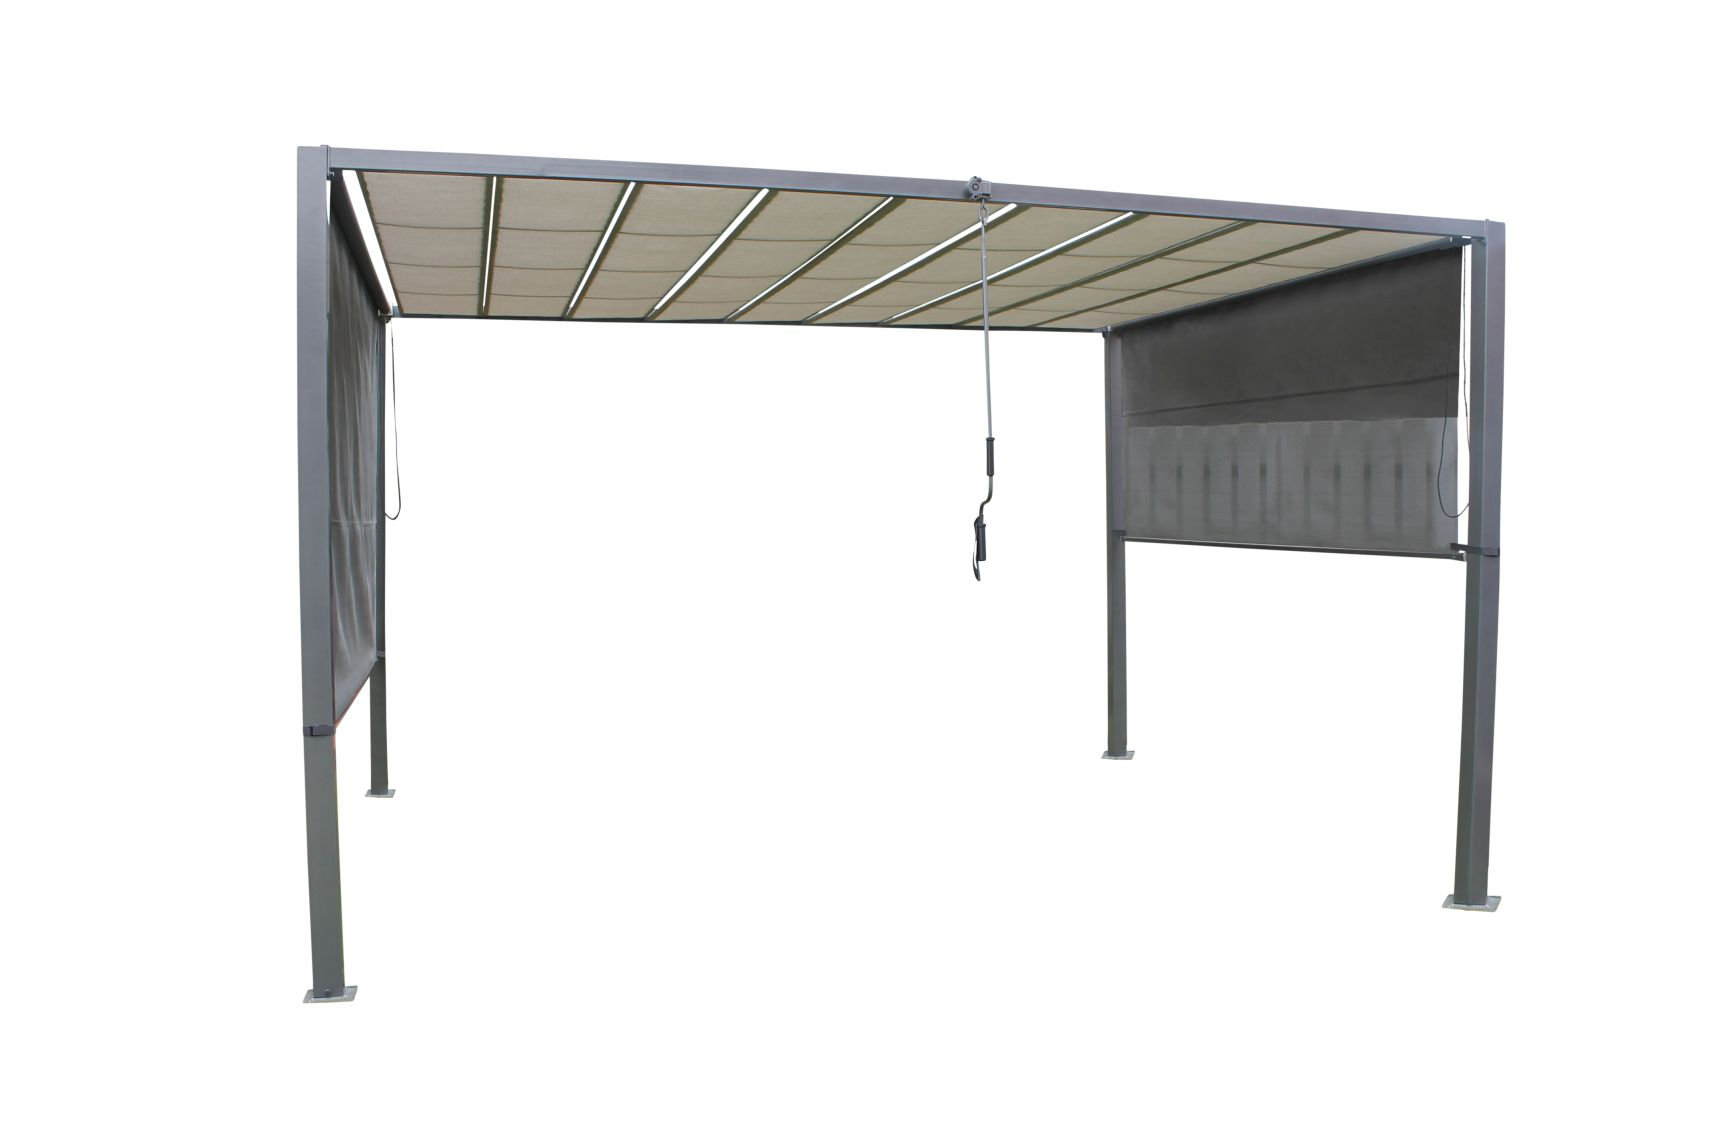 garten im quadrat gro e design garten pergola mit. Black Bedroom Furniture Sets. Home Design Ideas